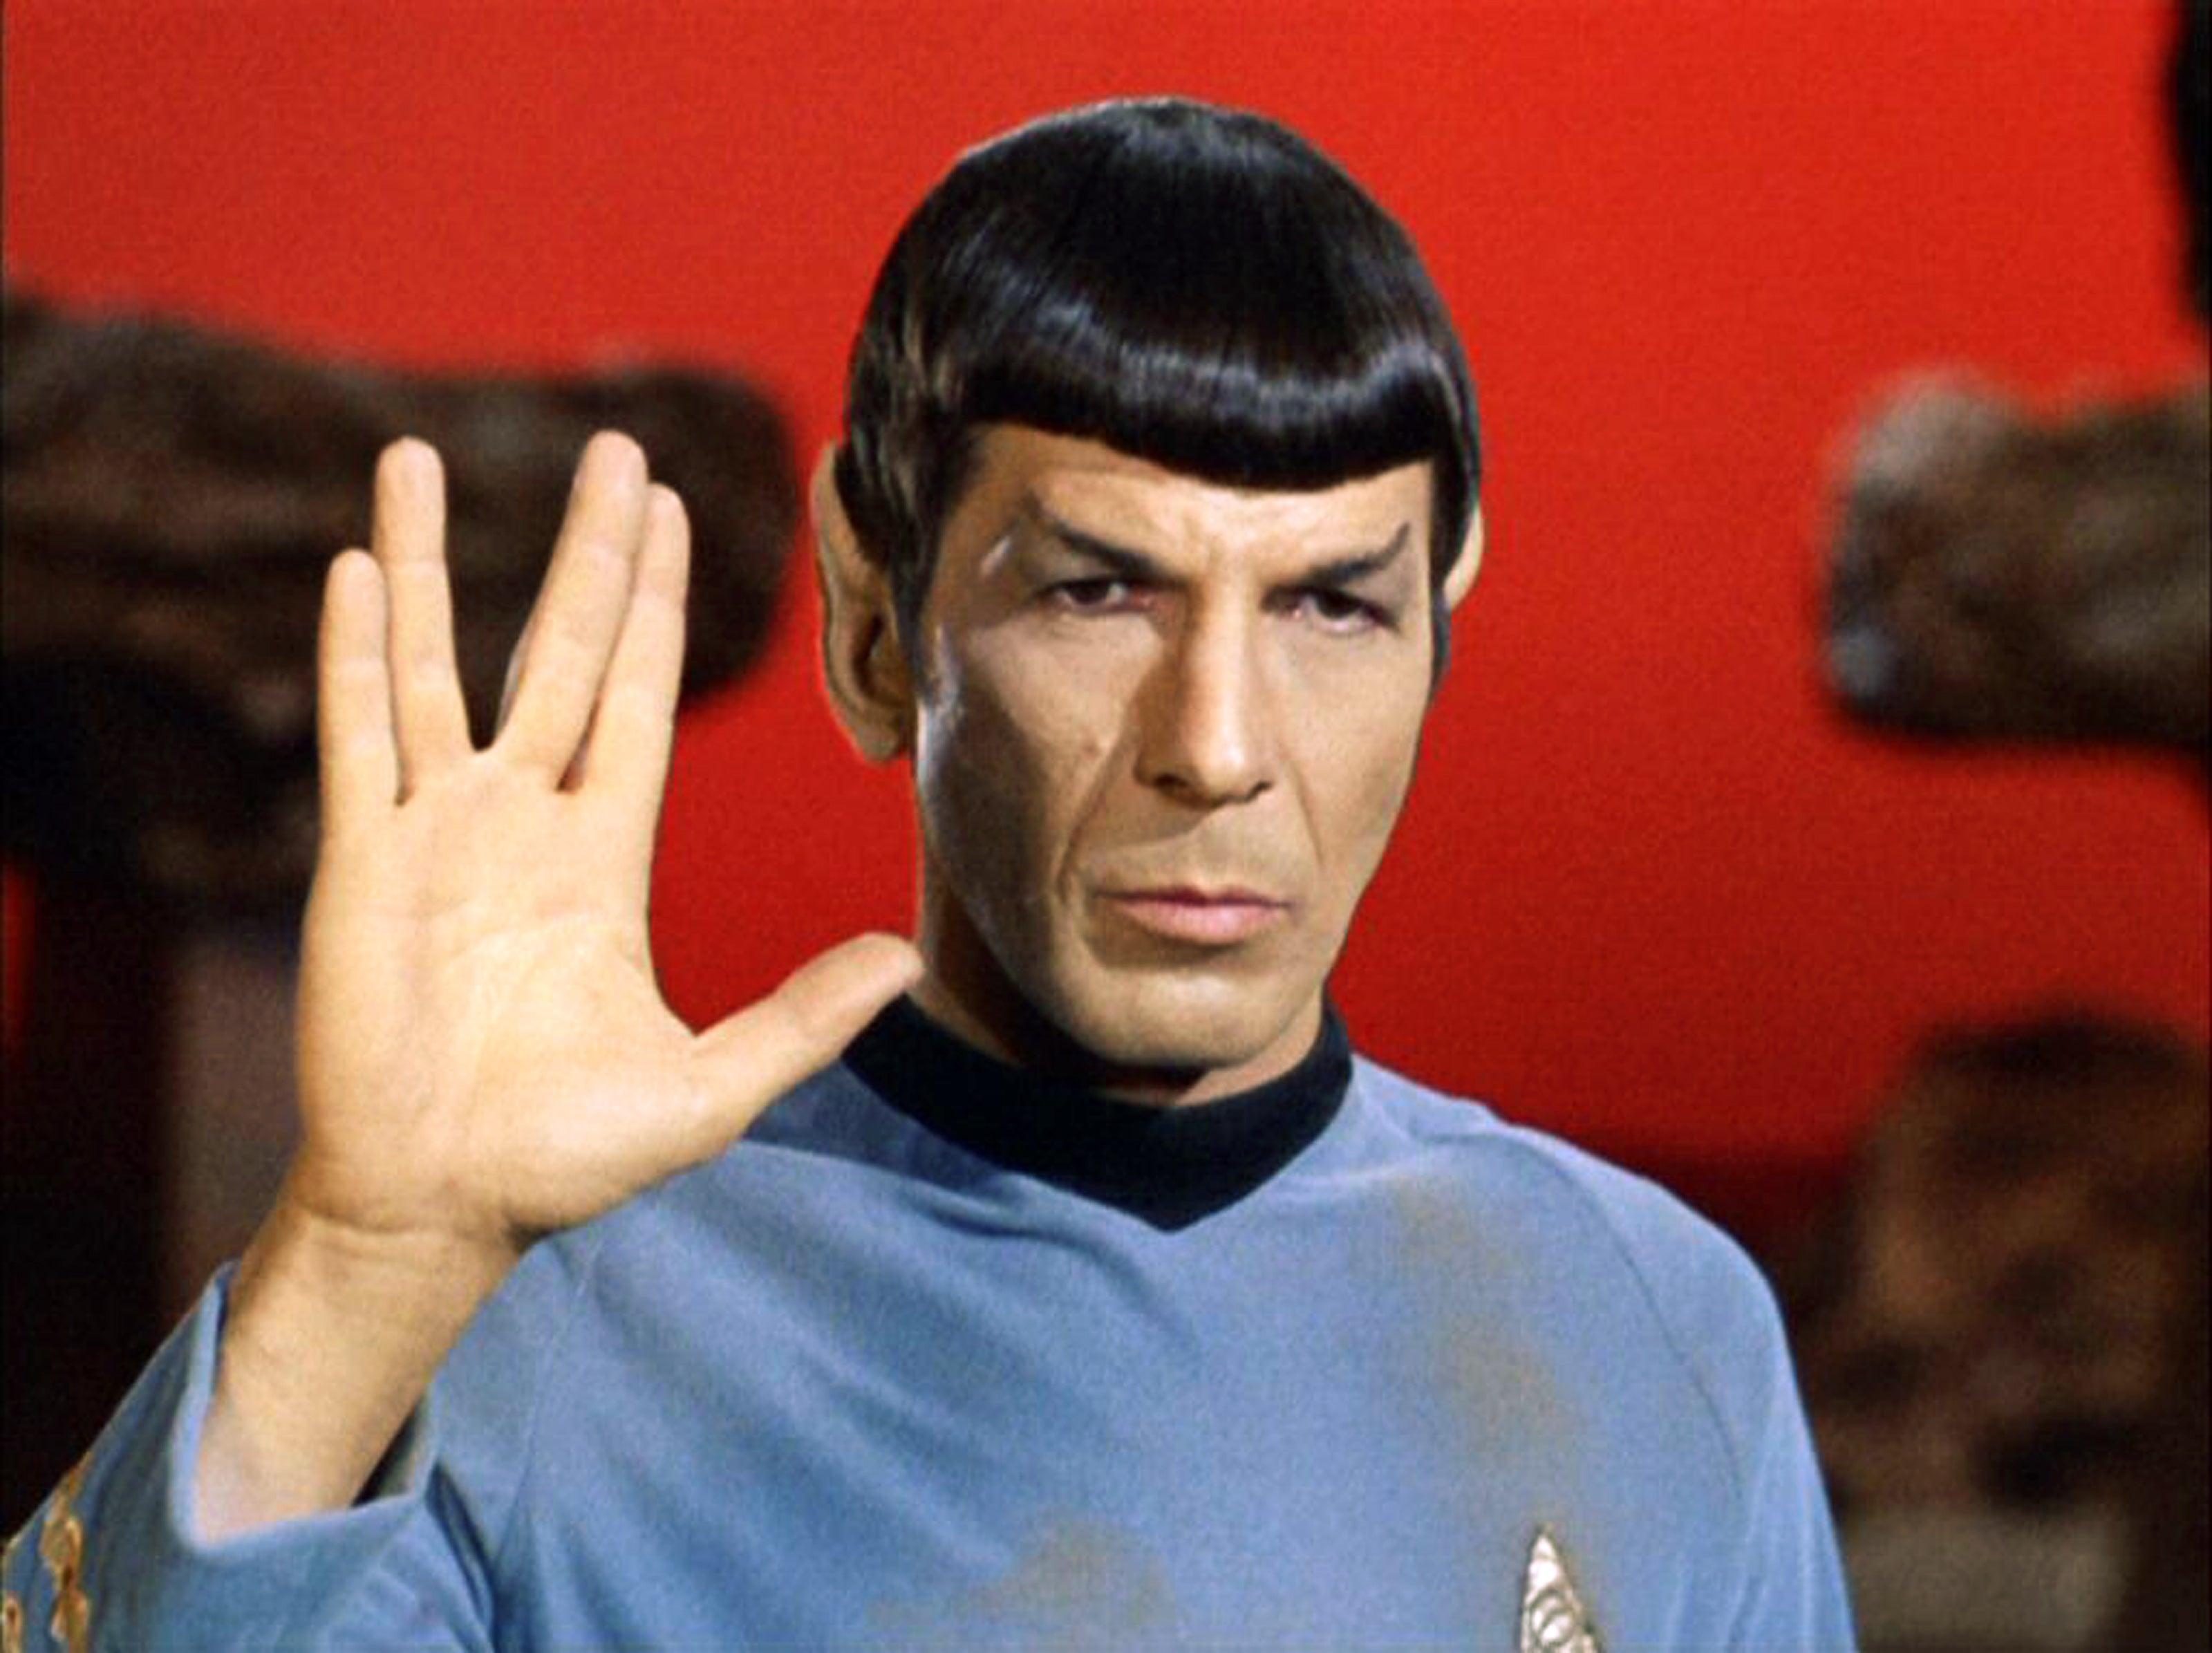 Kirk, Spock and Darwin